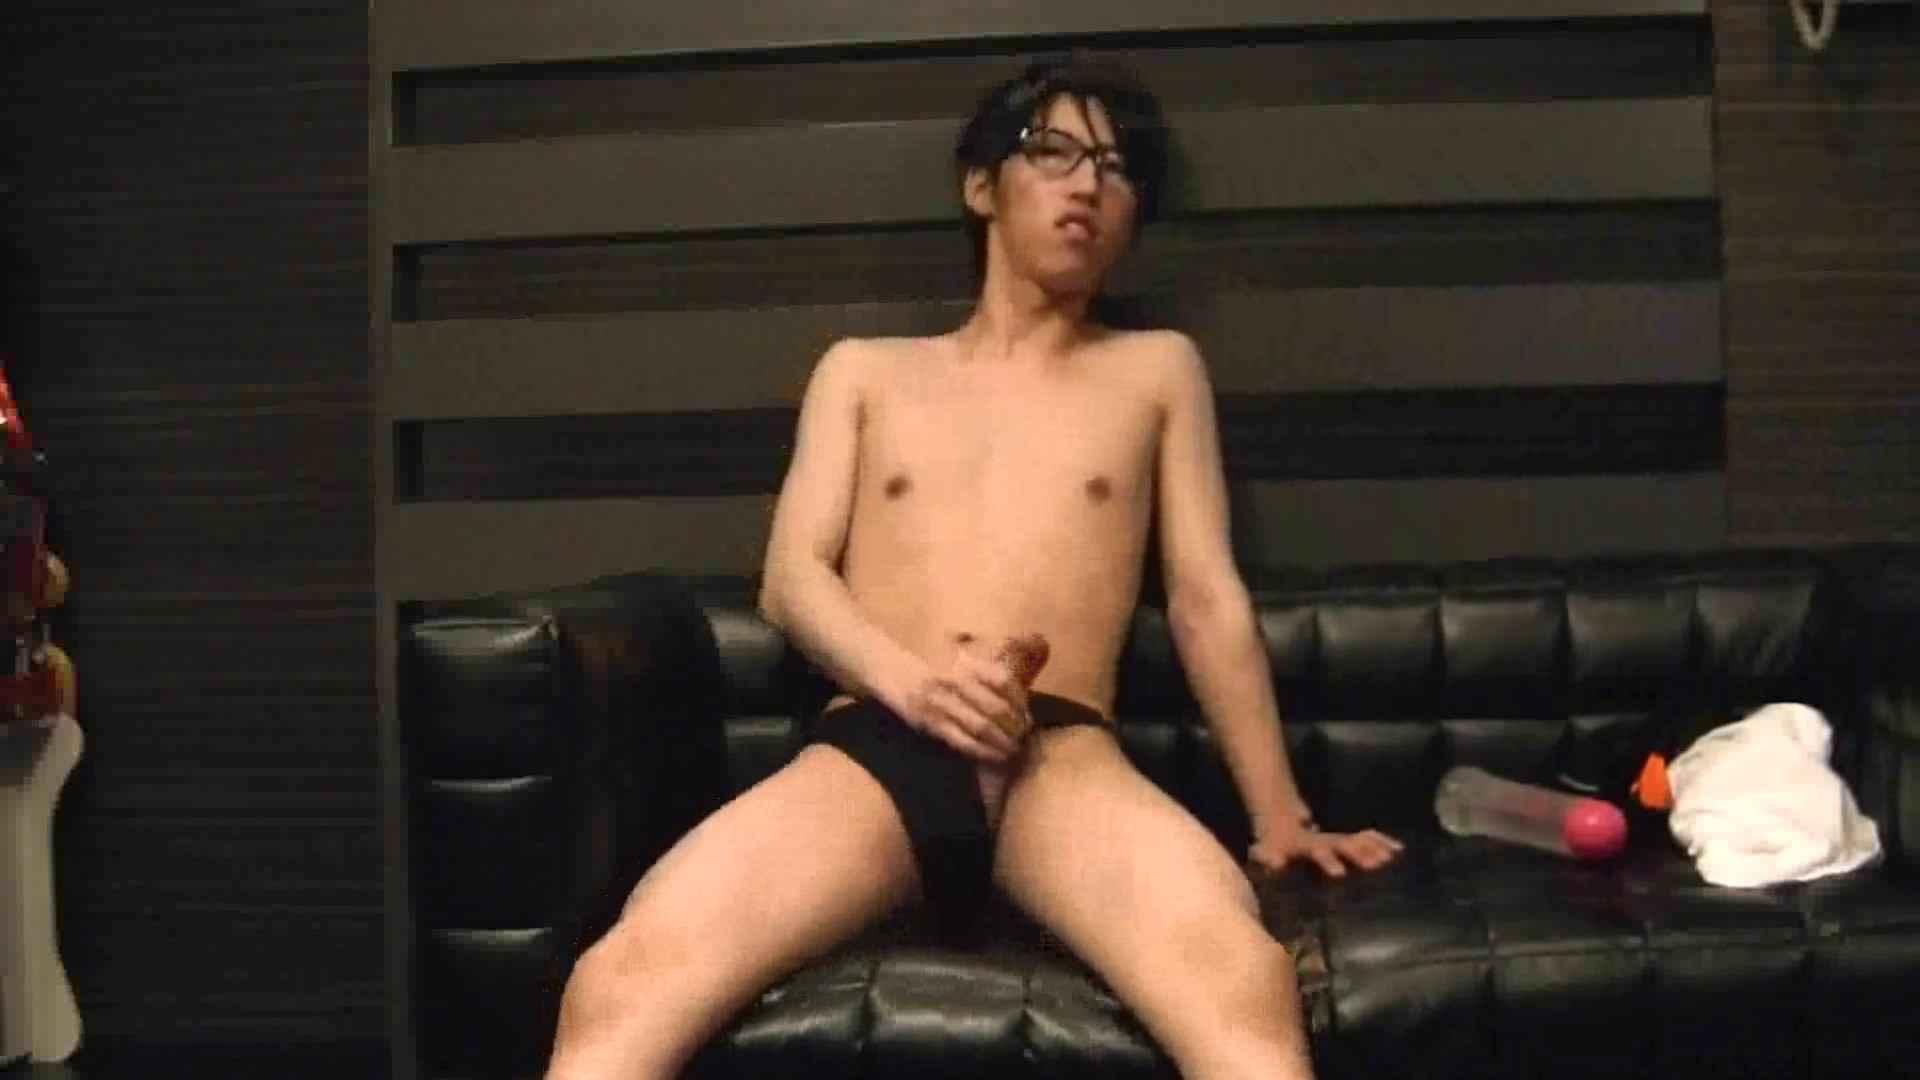 ONA見せカーニバル!! Vol3 男  93pic 70